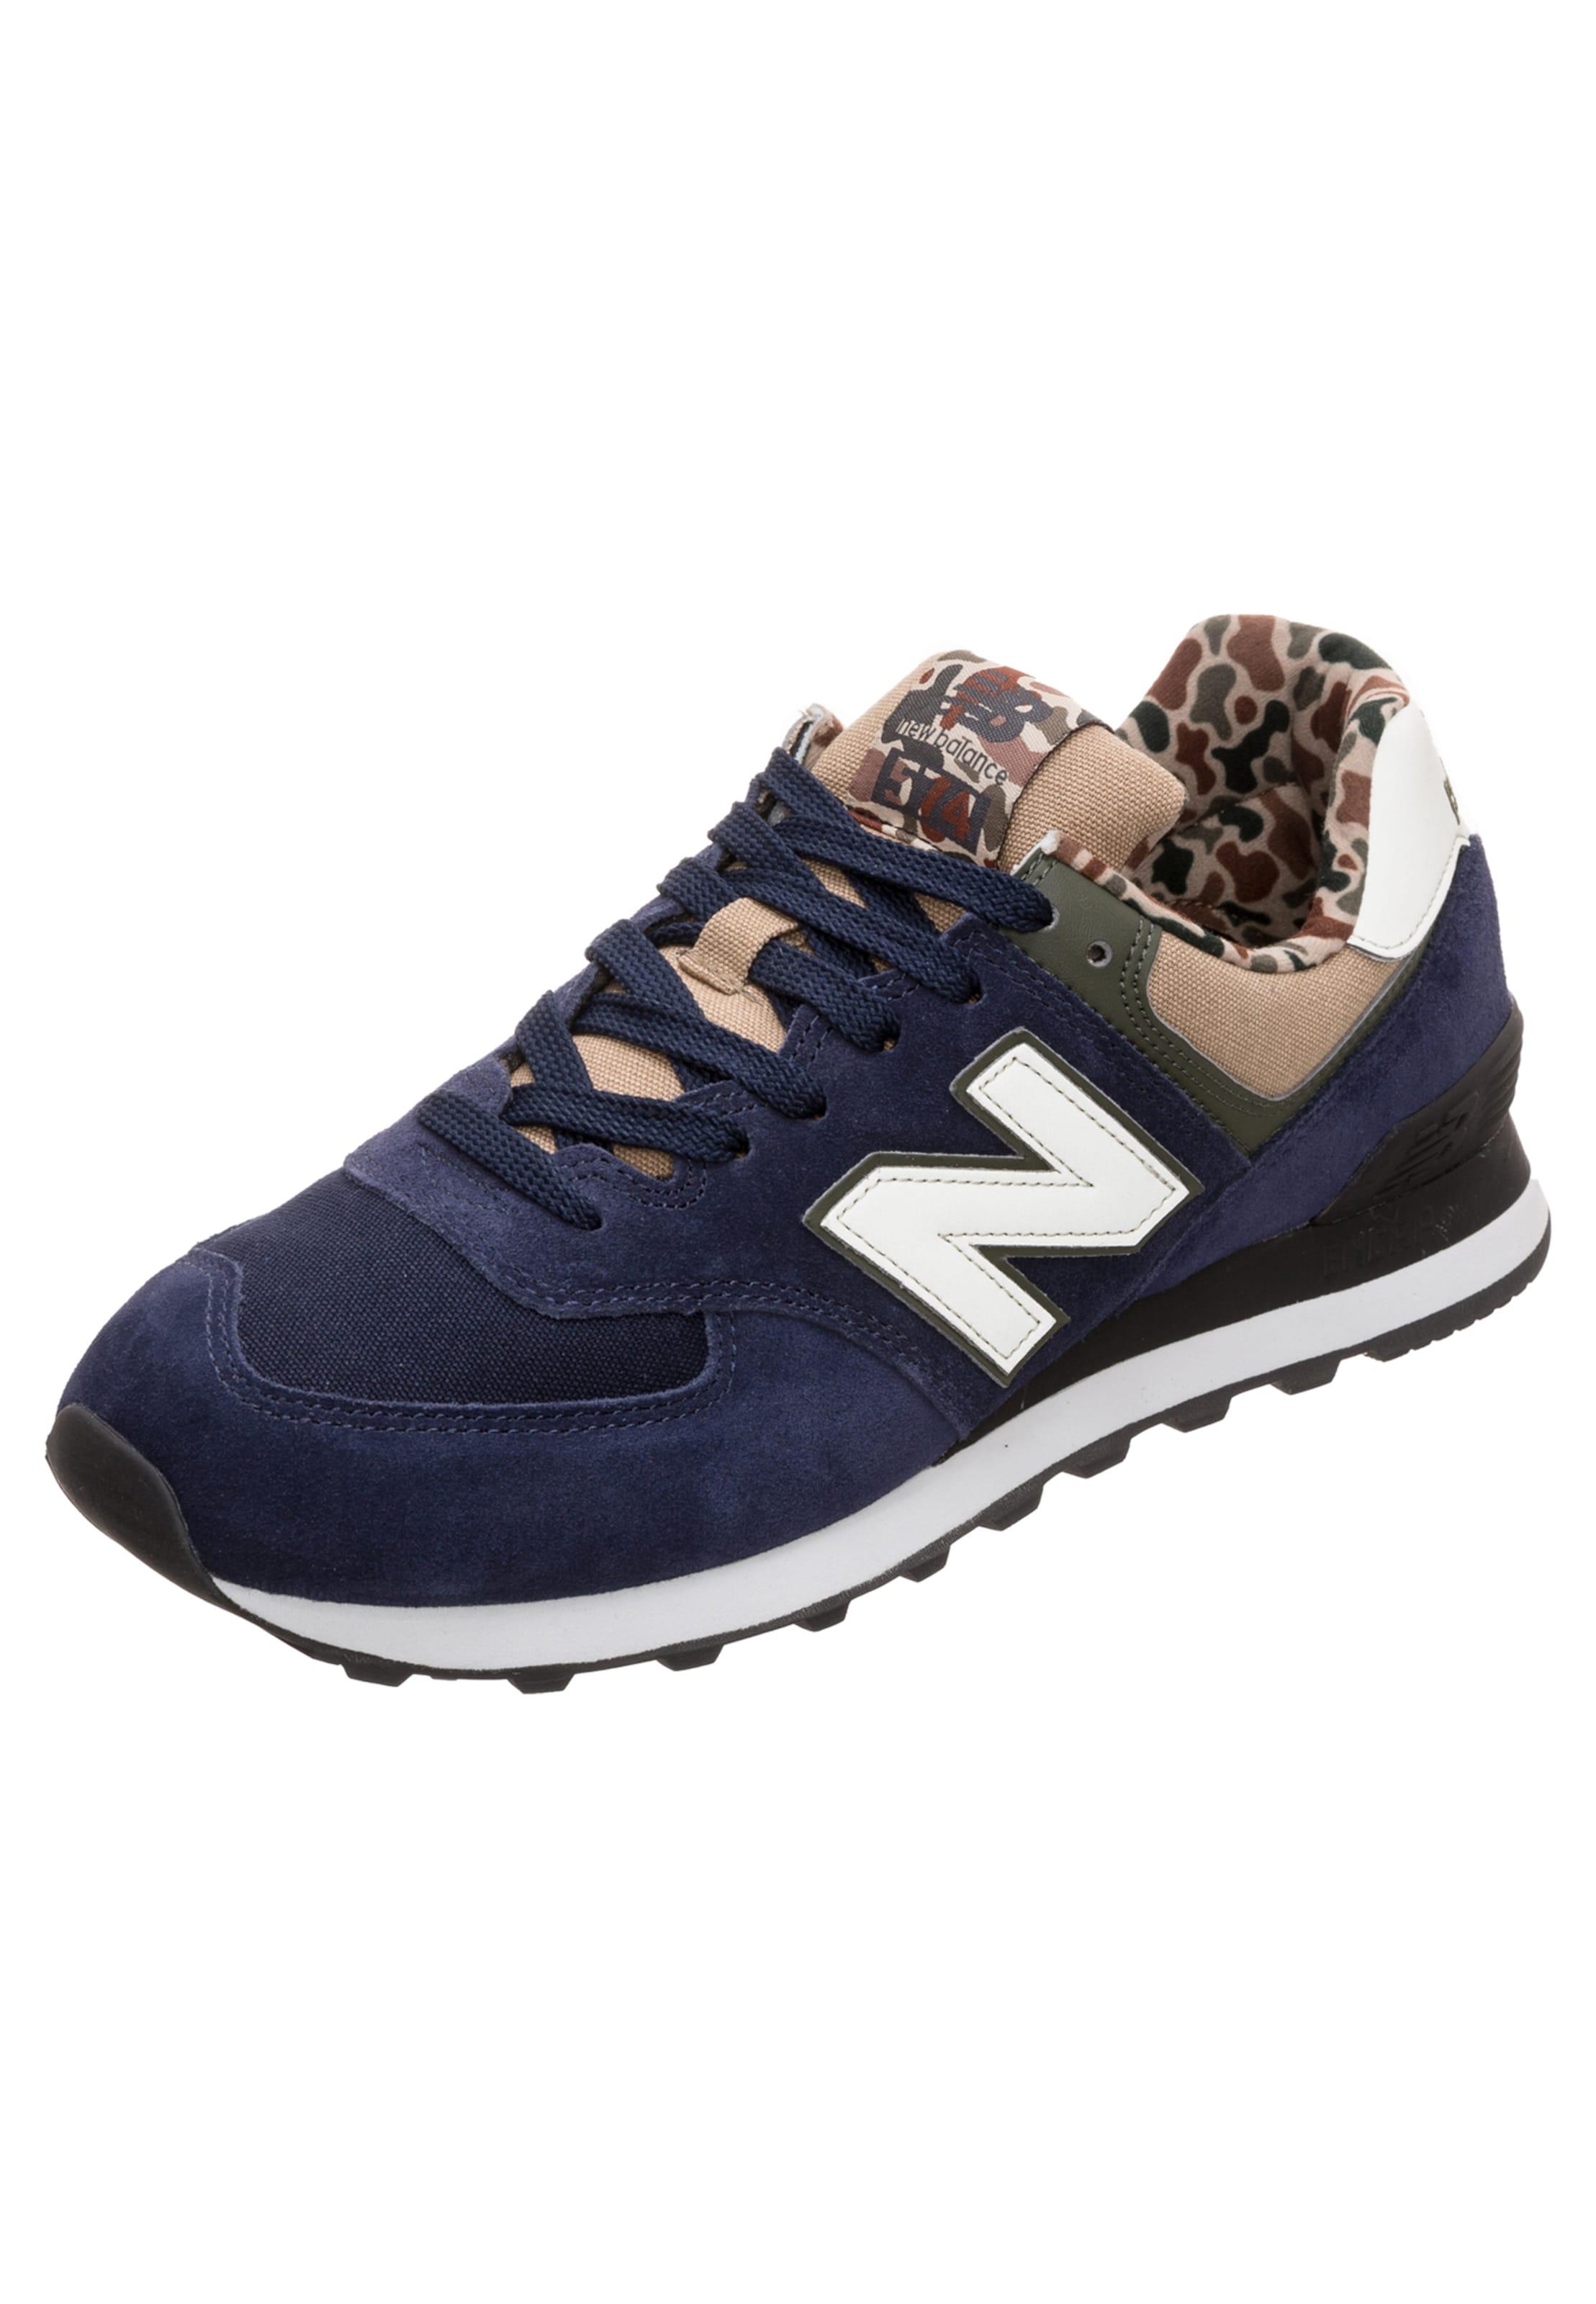 new balance ML574-HVA-D Sneaker Günstige und langlebige Schuhe